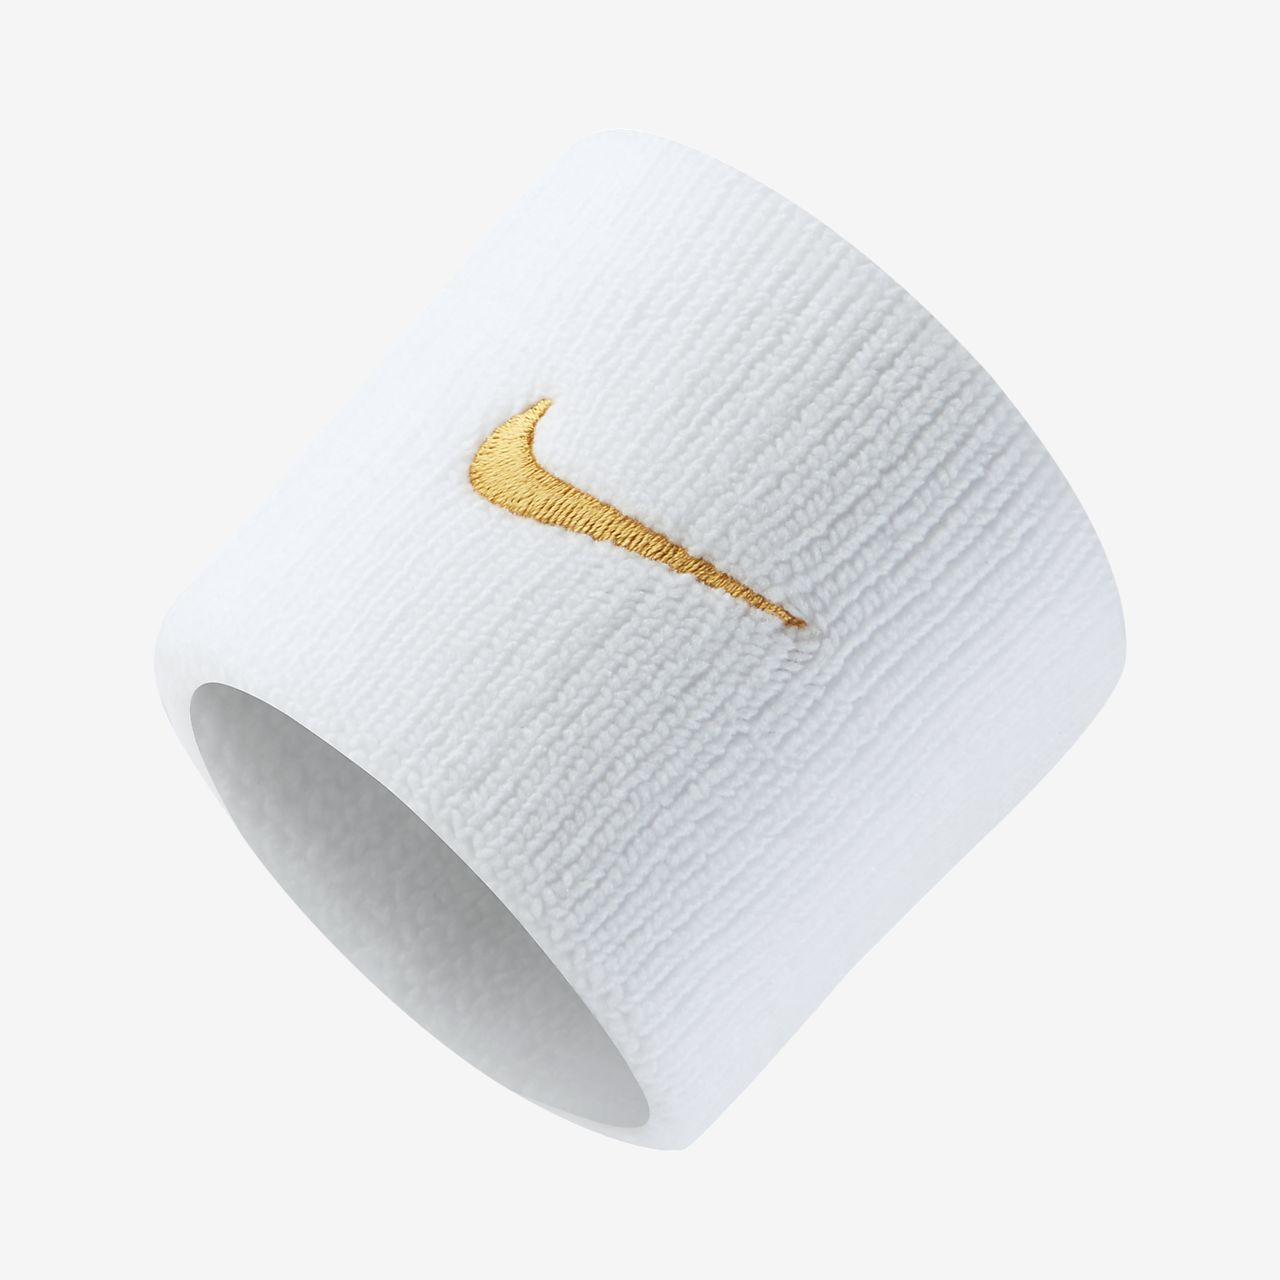 NikeCourt Premier Tennis Wristbands